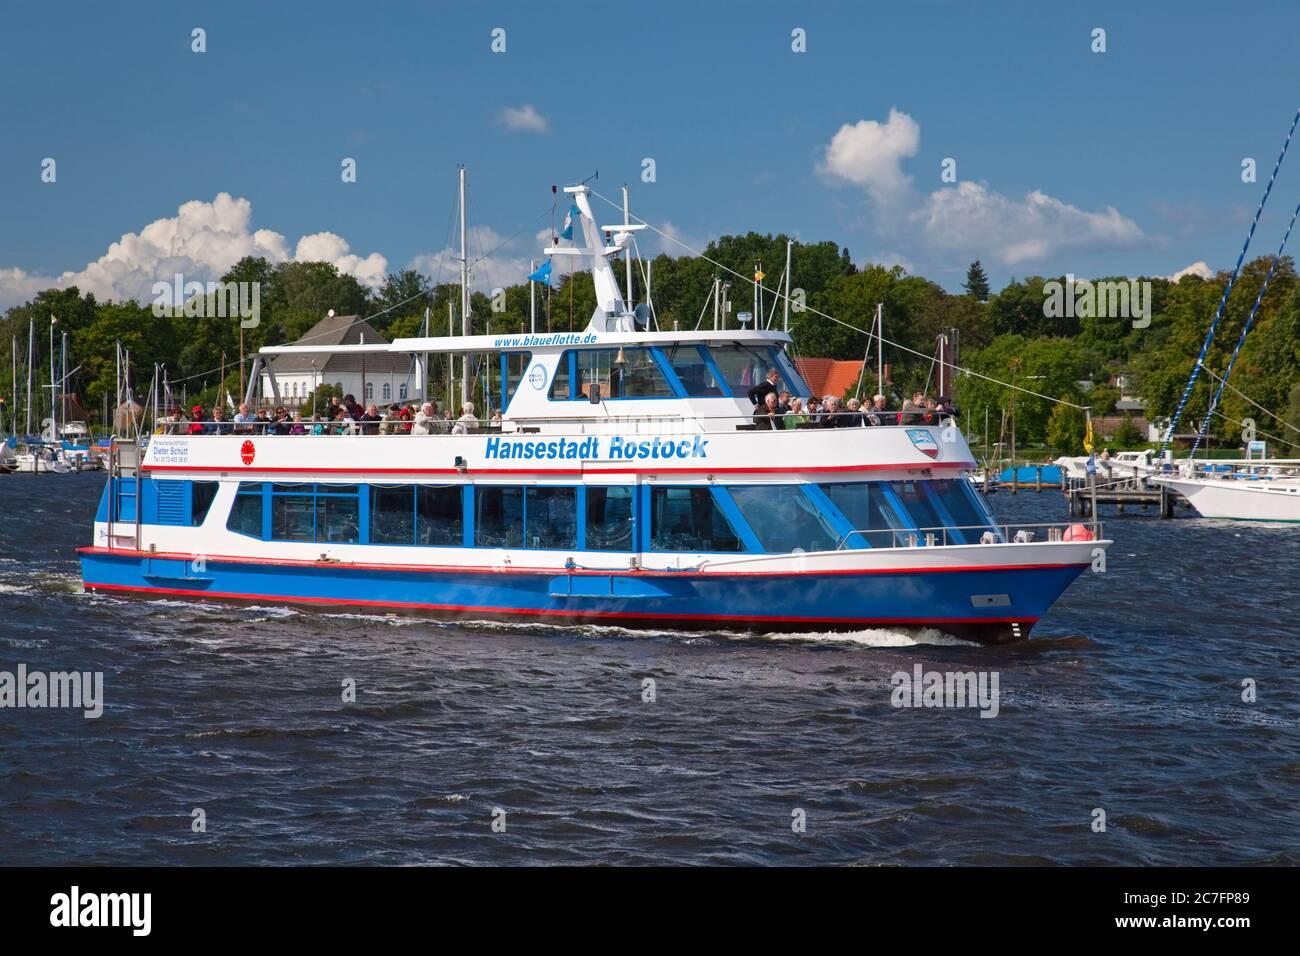 Germany, Mecklenburg-West Pomerania, Baltic Sea, Baltic Sea coast, Hanseatic town. Stock Photo